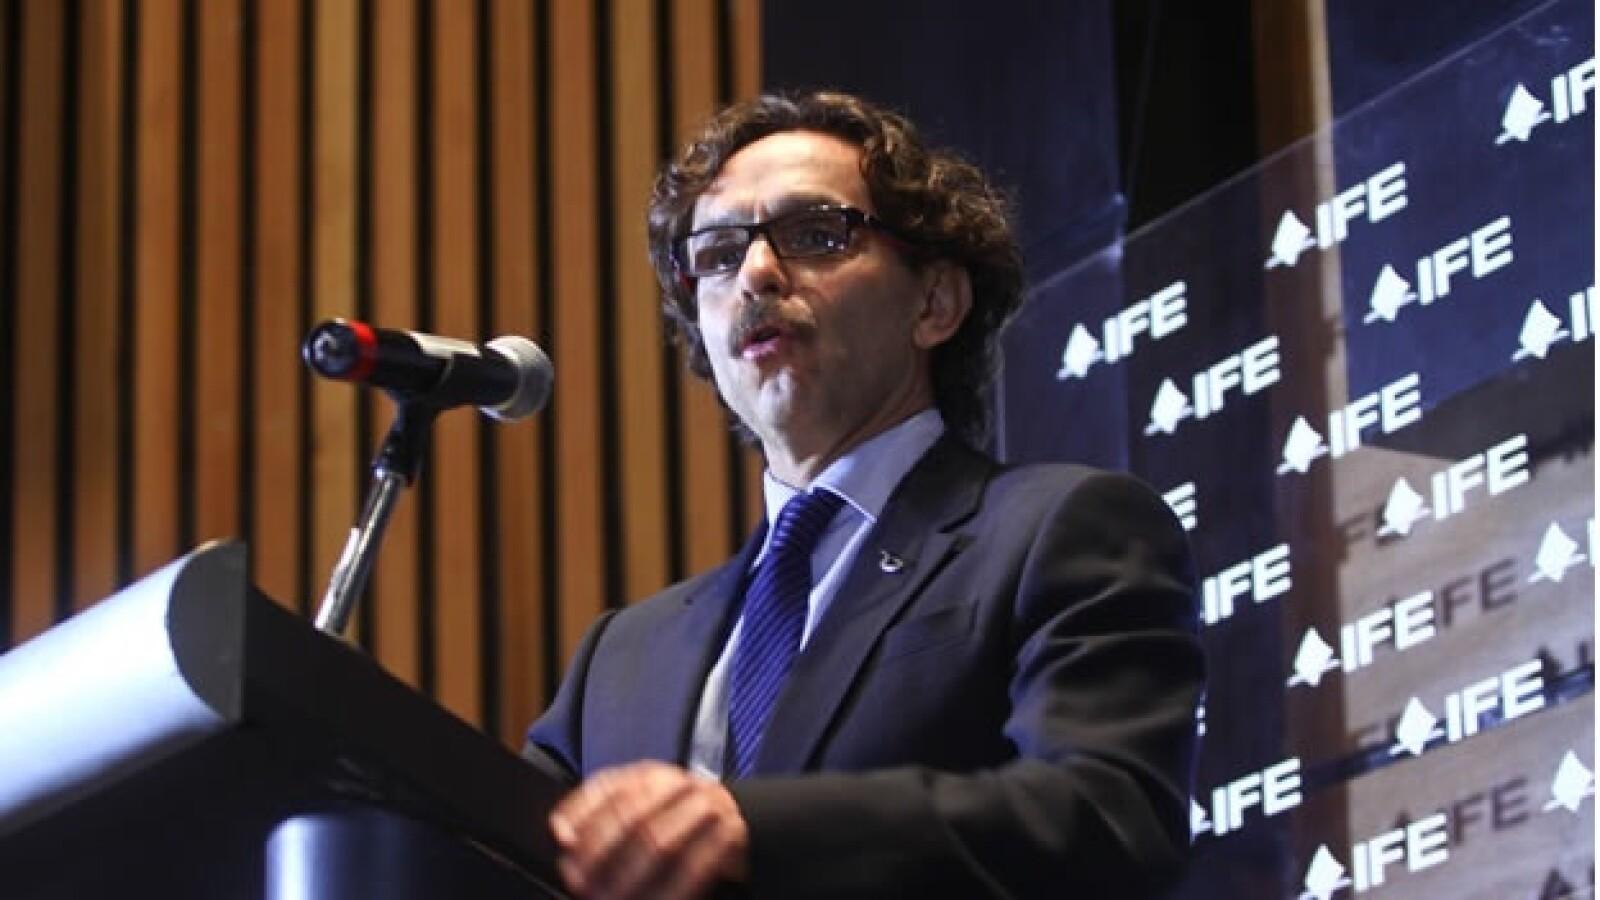 Quadri se registra como candidato a la presidencia ante el IFE